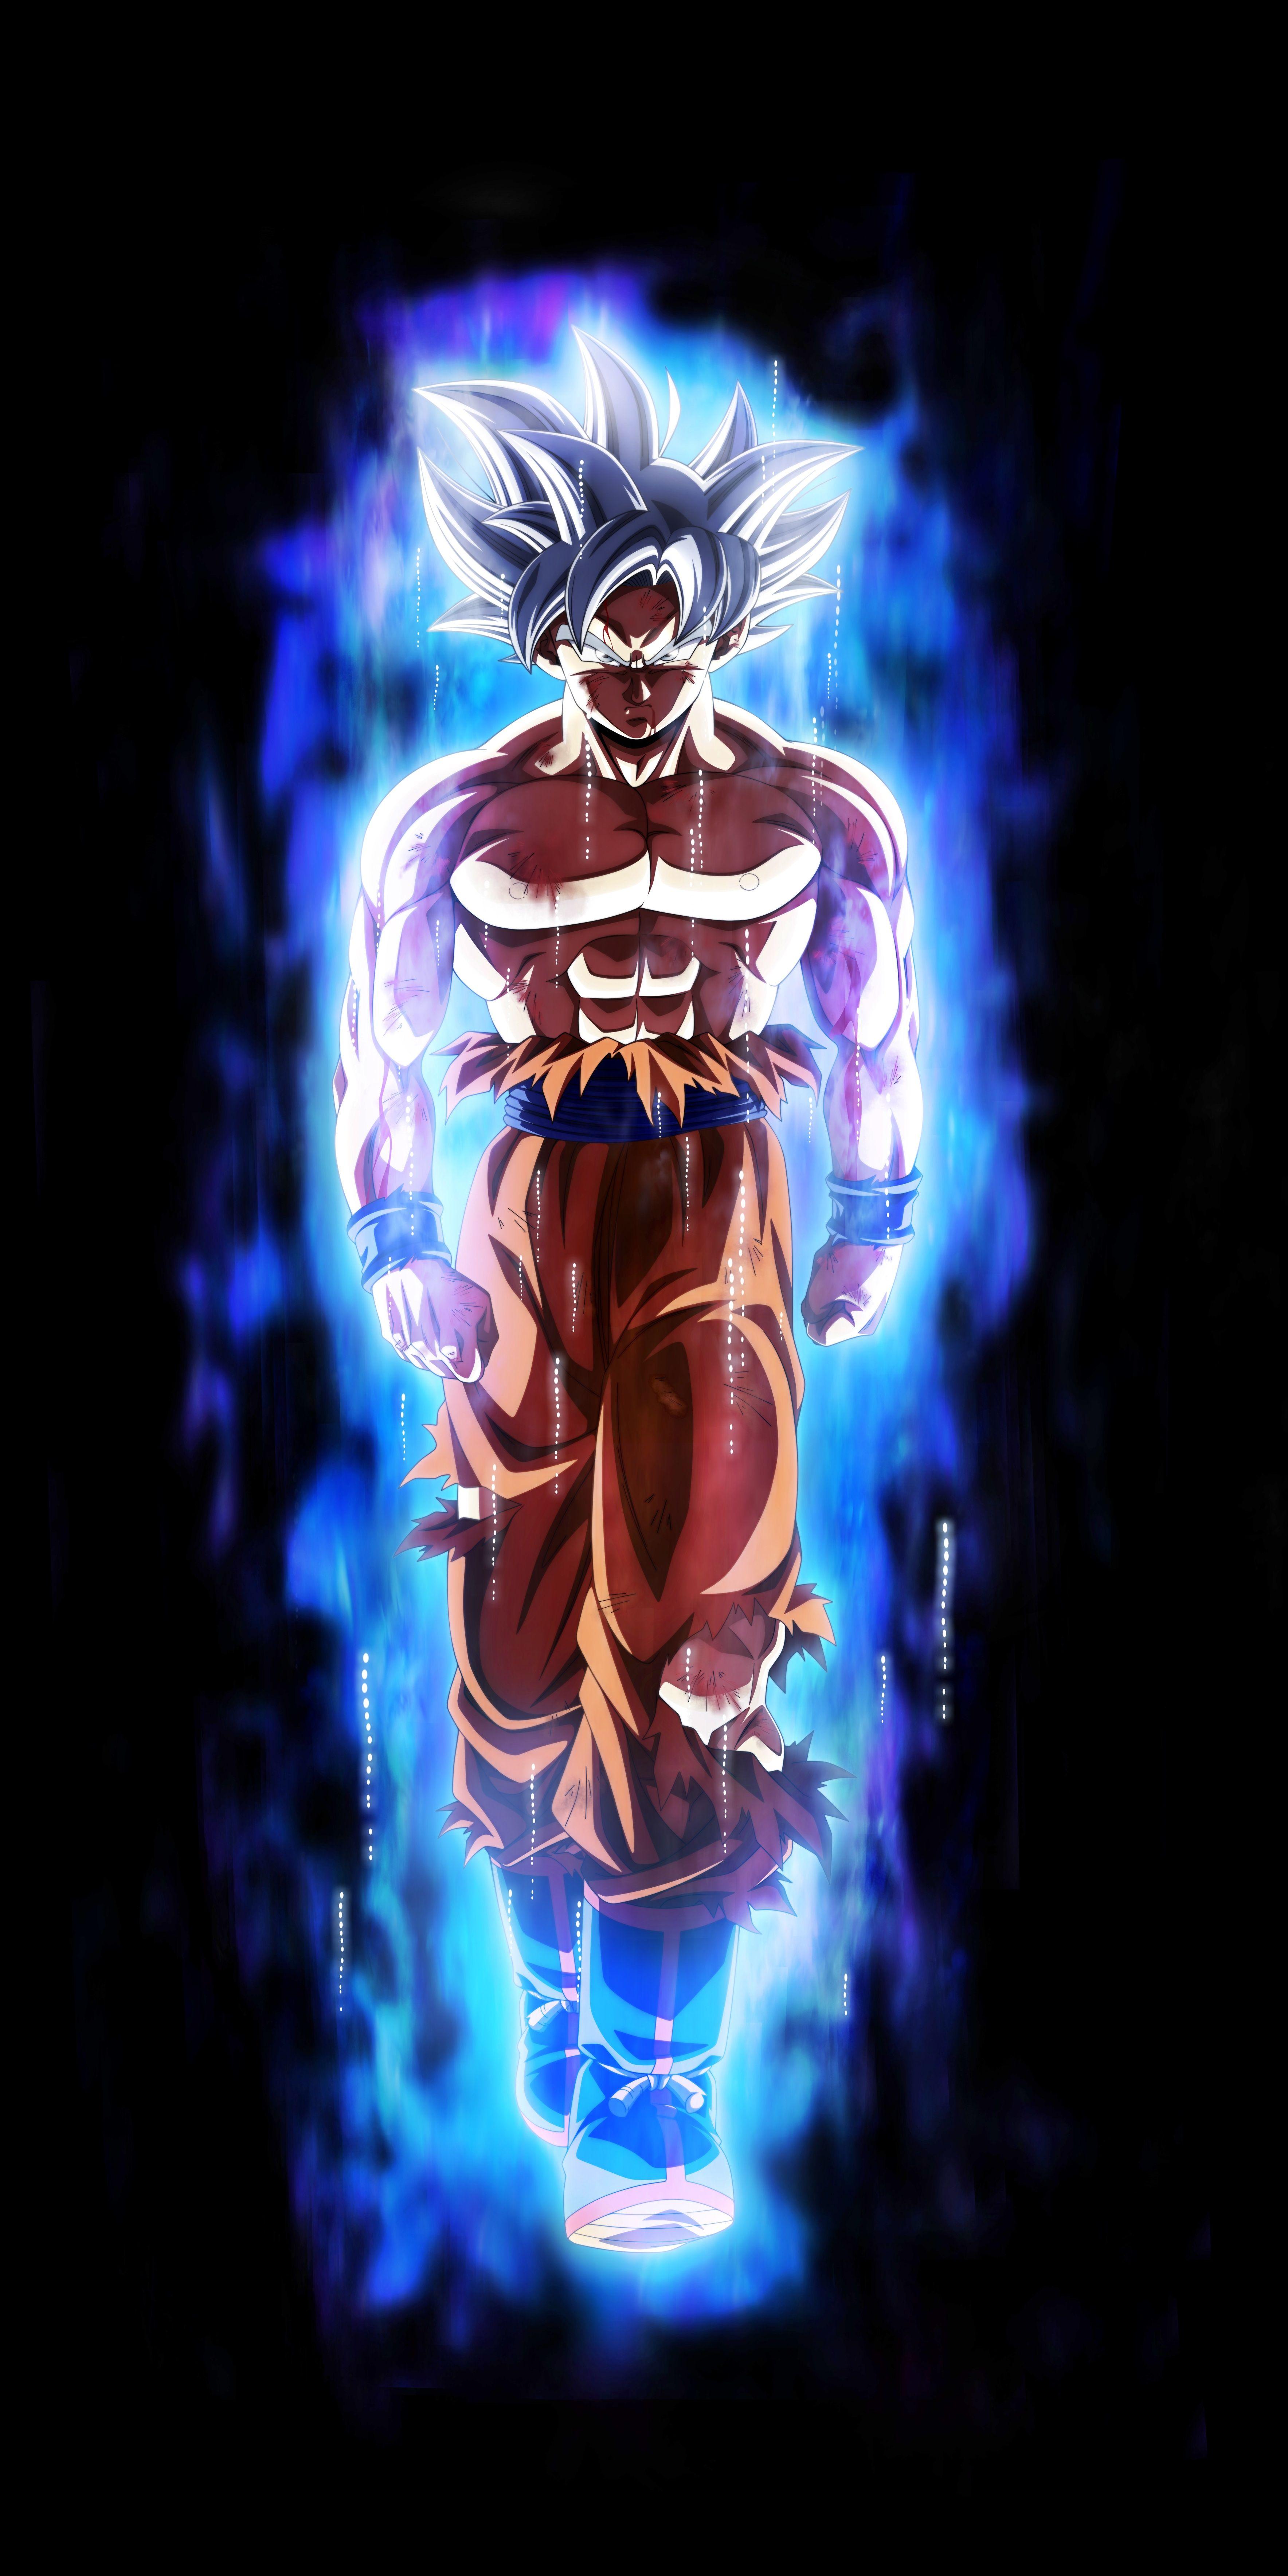 Goku Ultra Instinto Dominado Universo 7 Dragon Ball Super Artwork Anime Dragon Ball Super Dragon Ball Super Goku